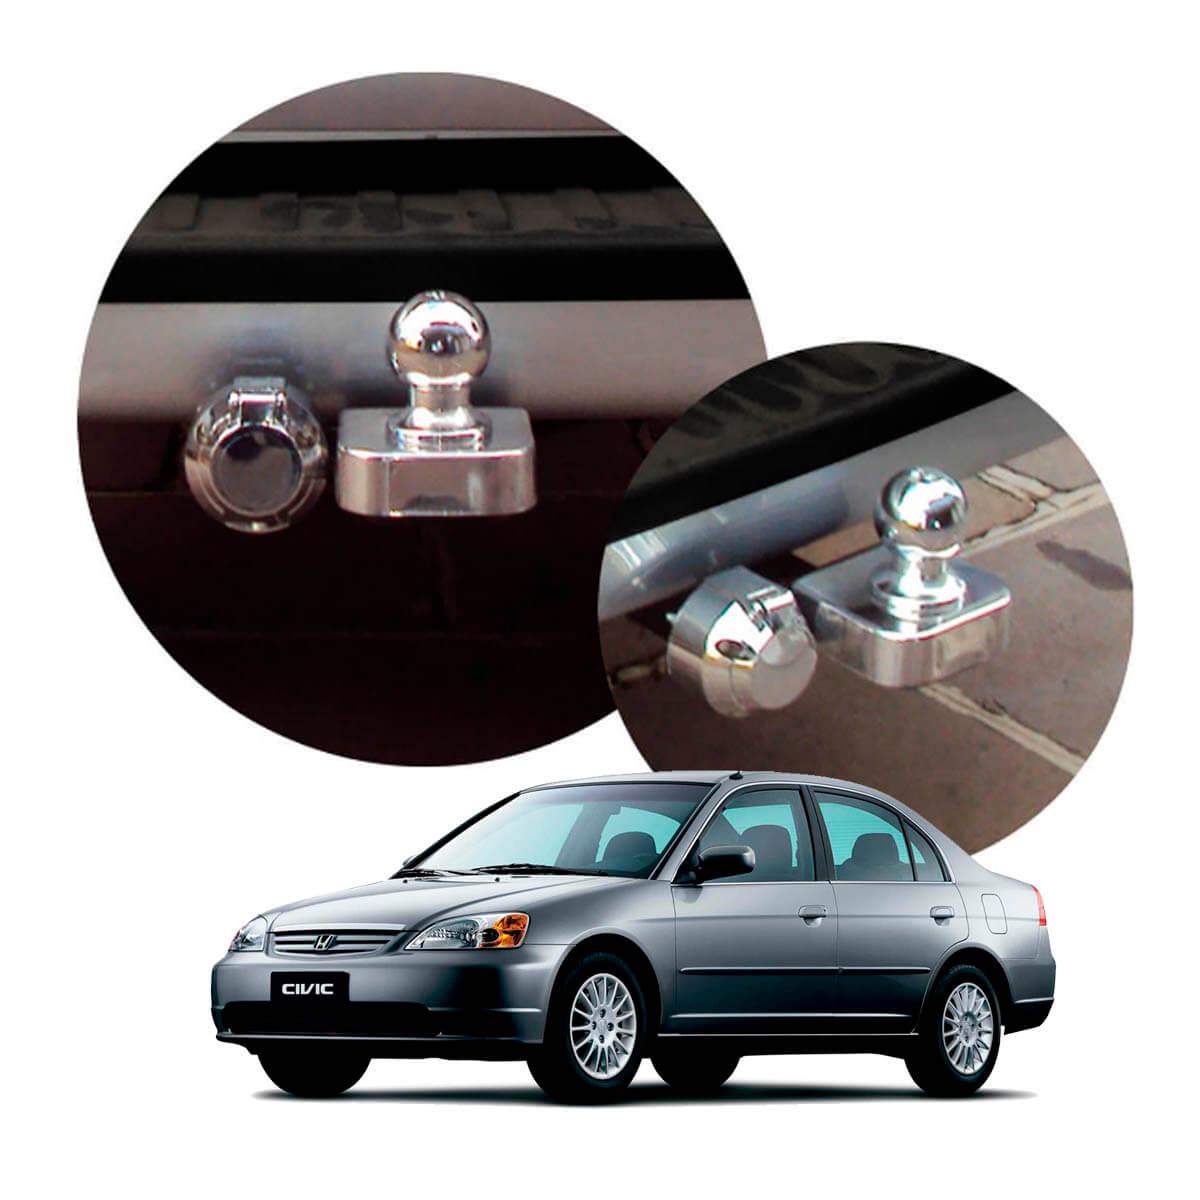 Engate de reboque fixo Civic 2001 a 2003